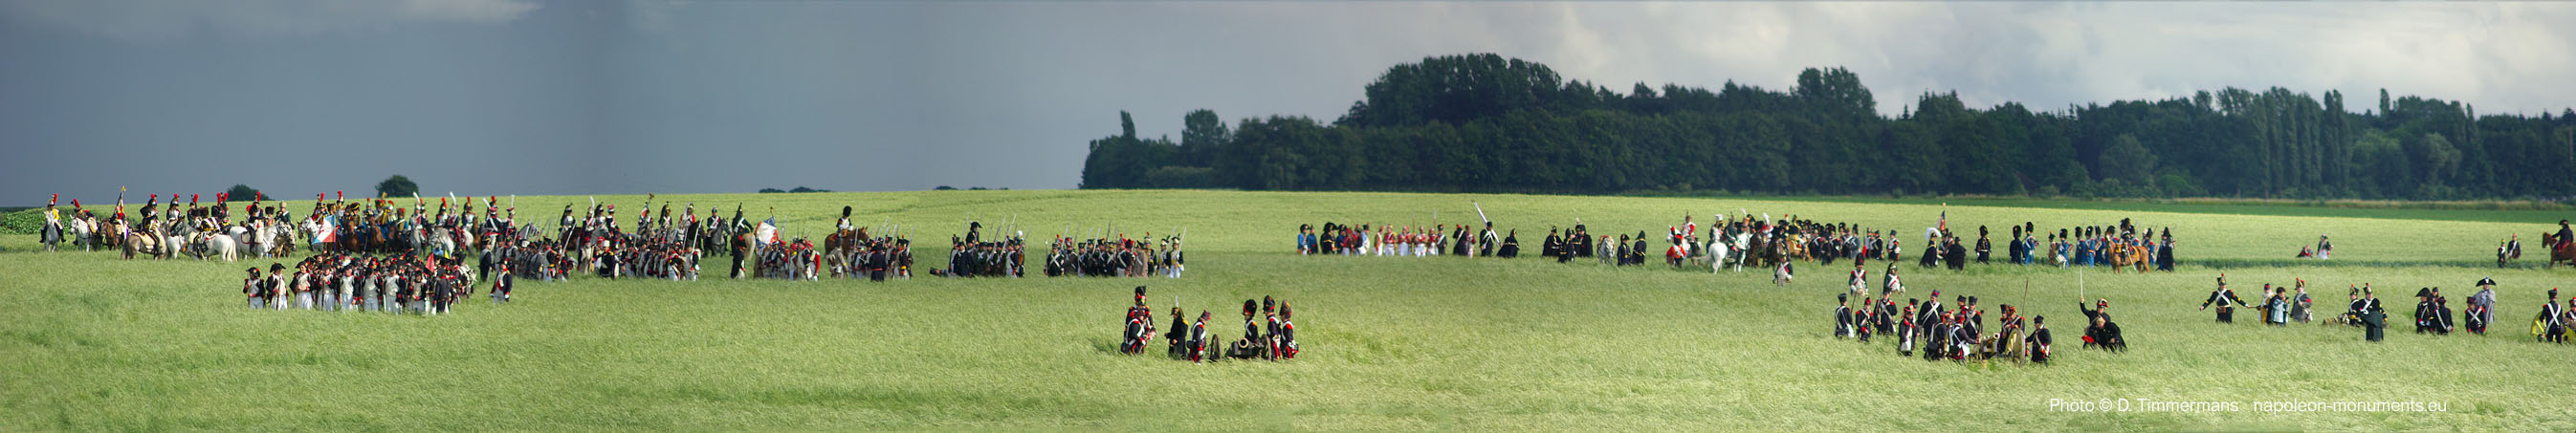 http://napoleon-monuments.eu/Napoleon1er/images/110618Goumont077PANO.jpg